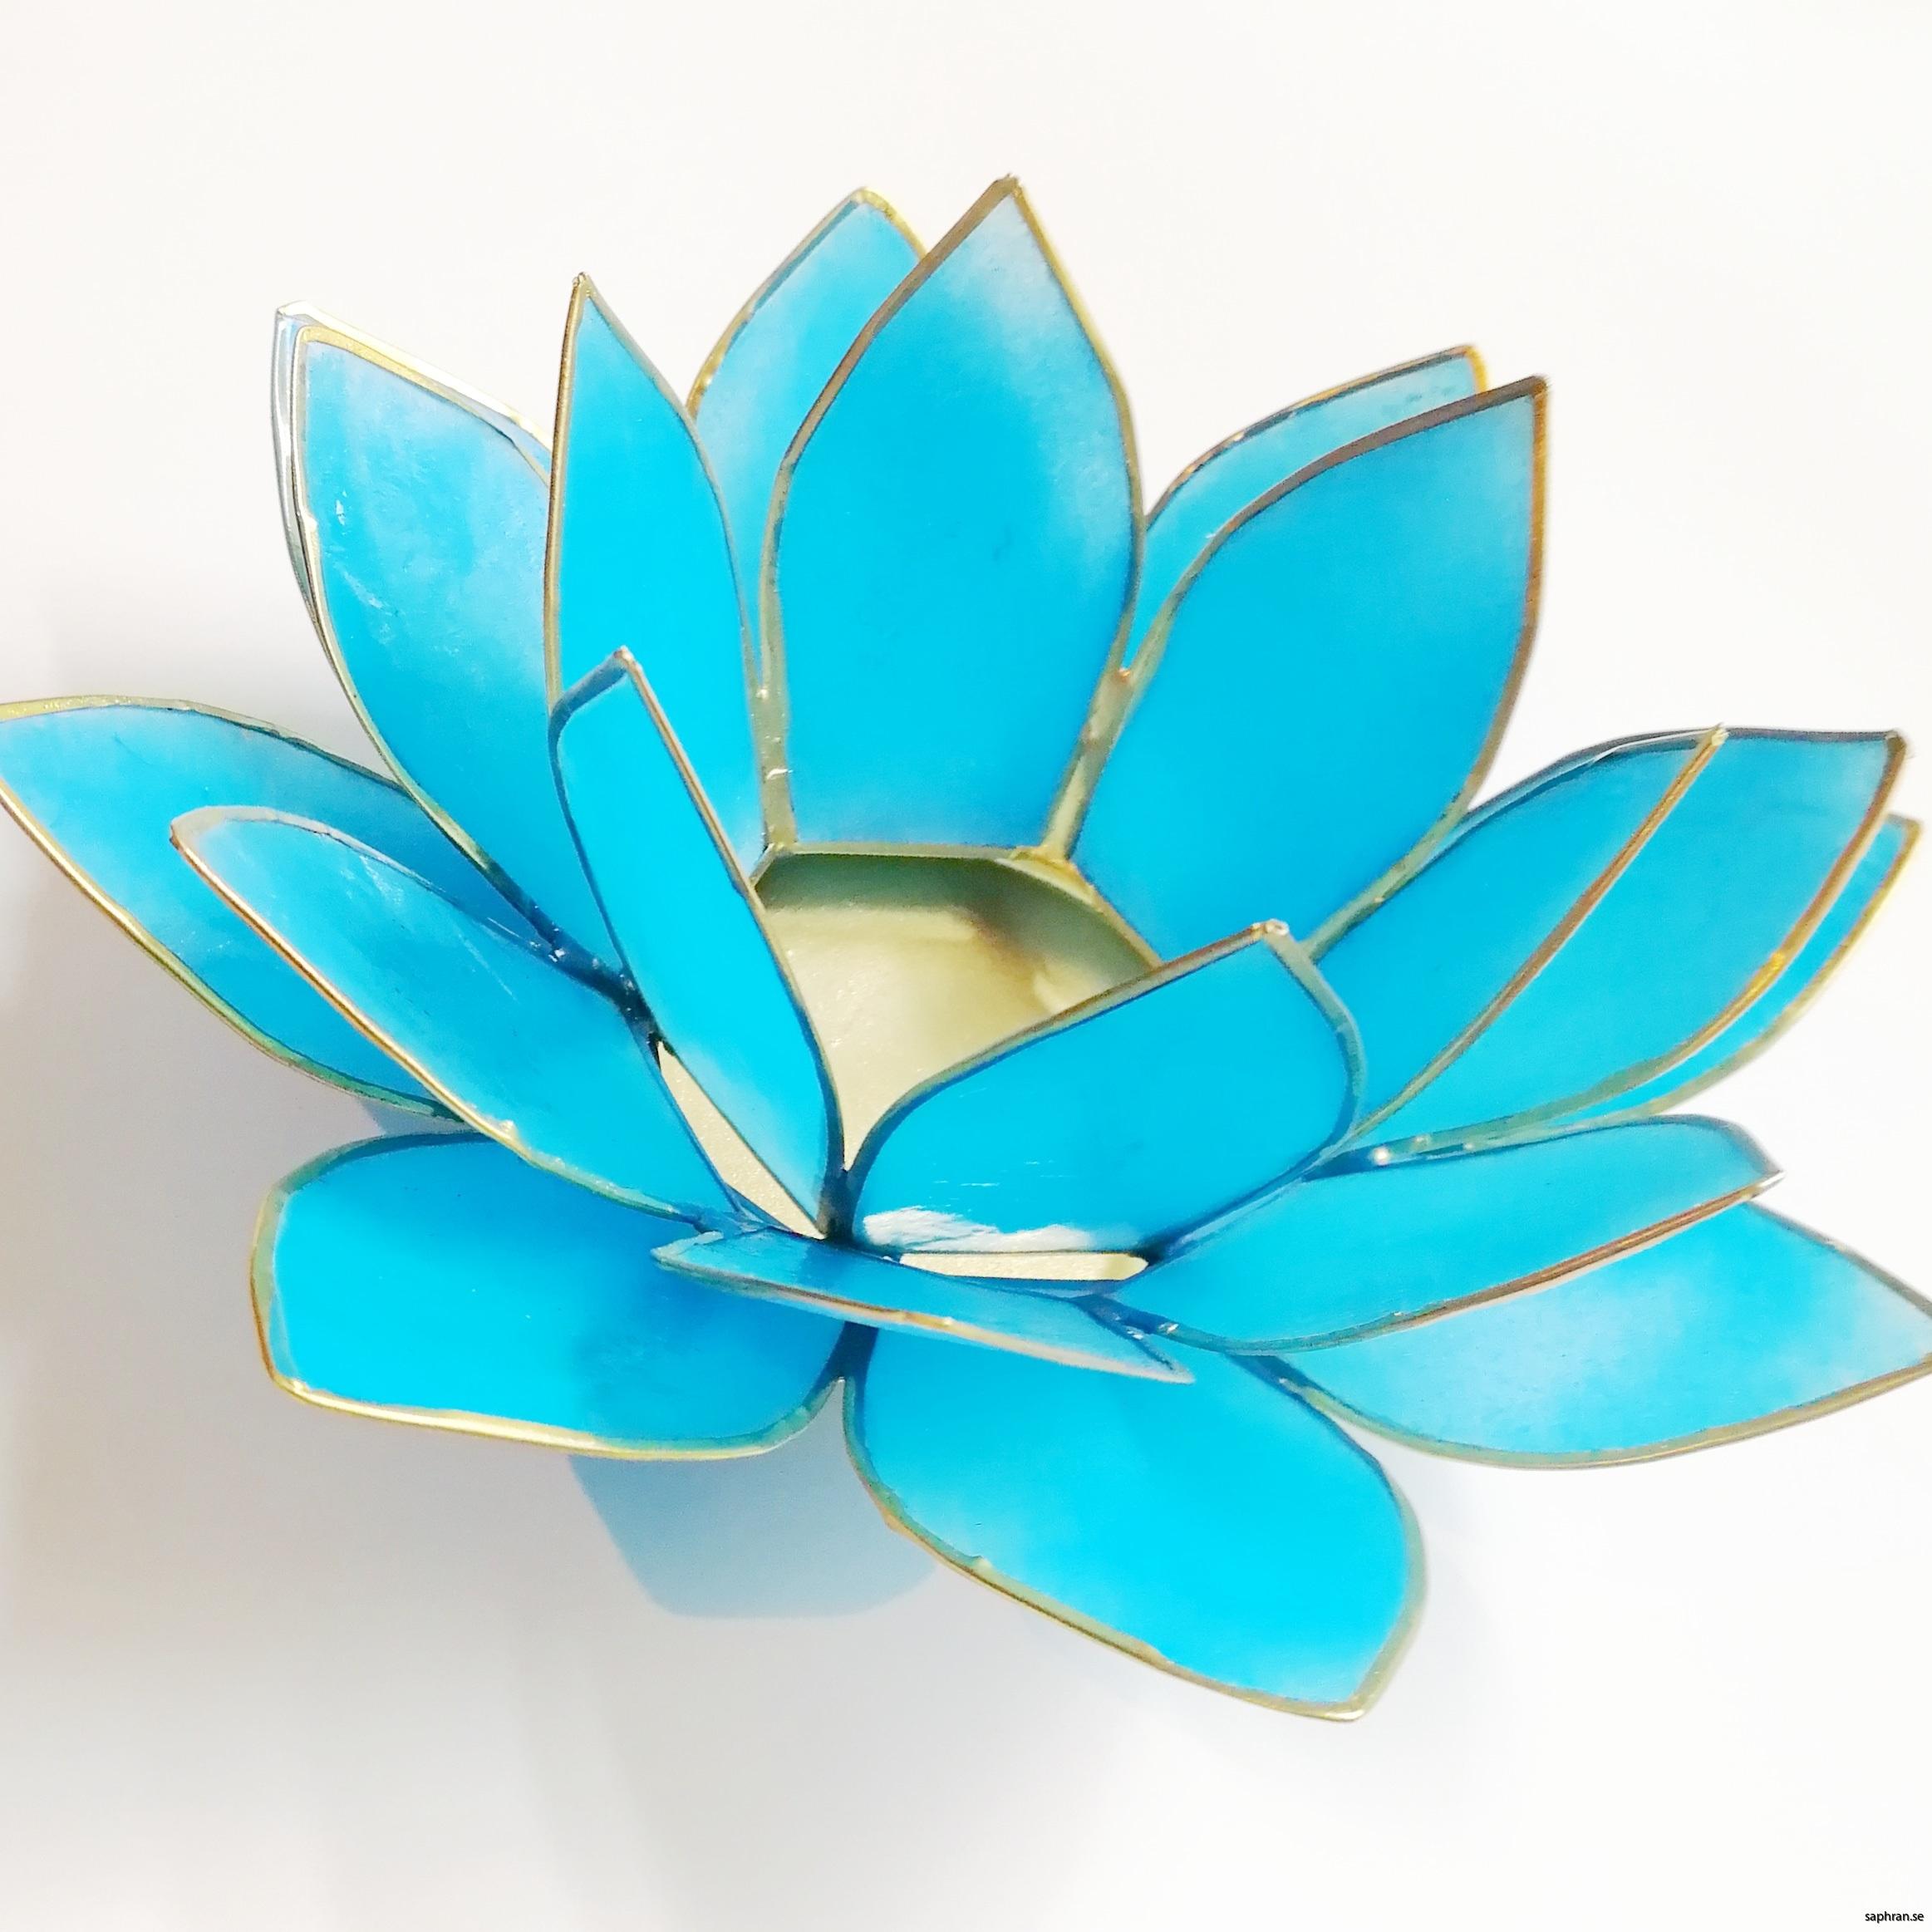 Lotusblomma ljuslykta 7 färger, tukos